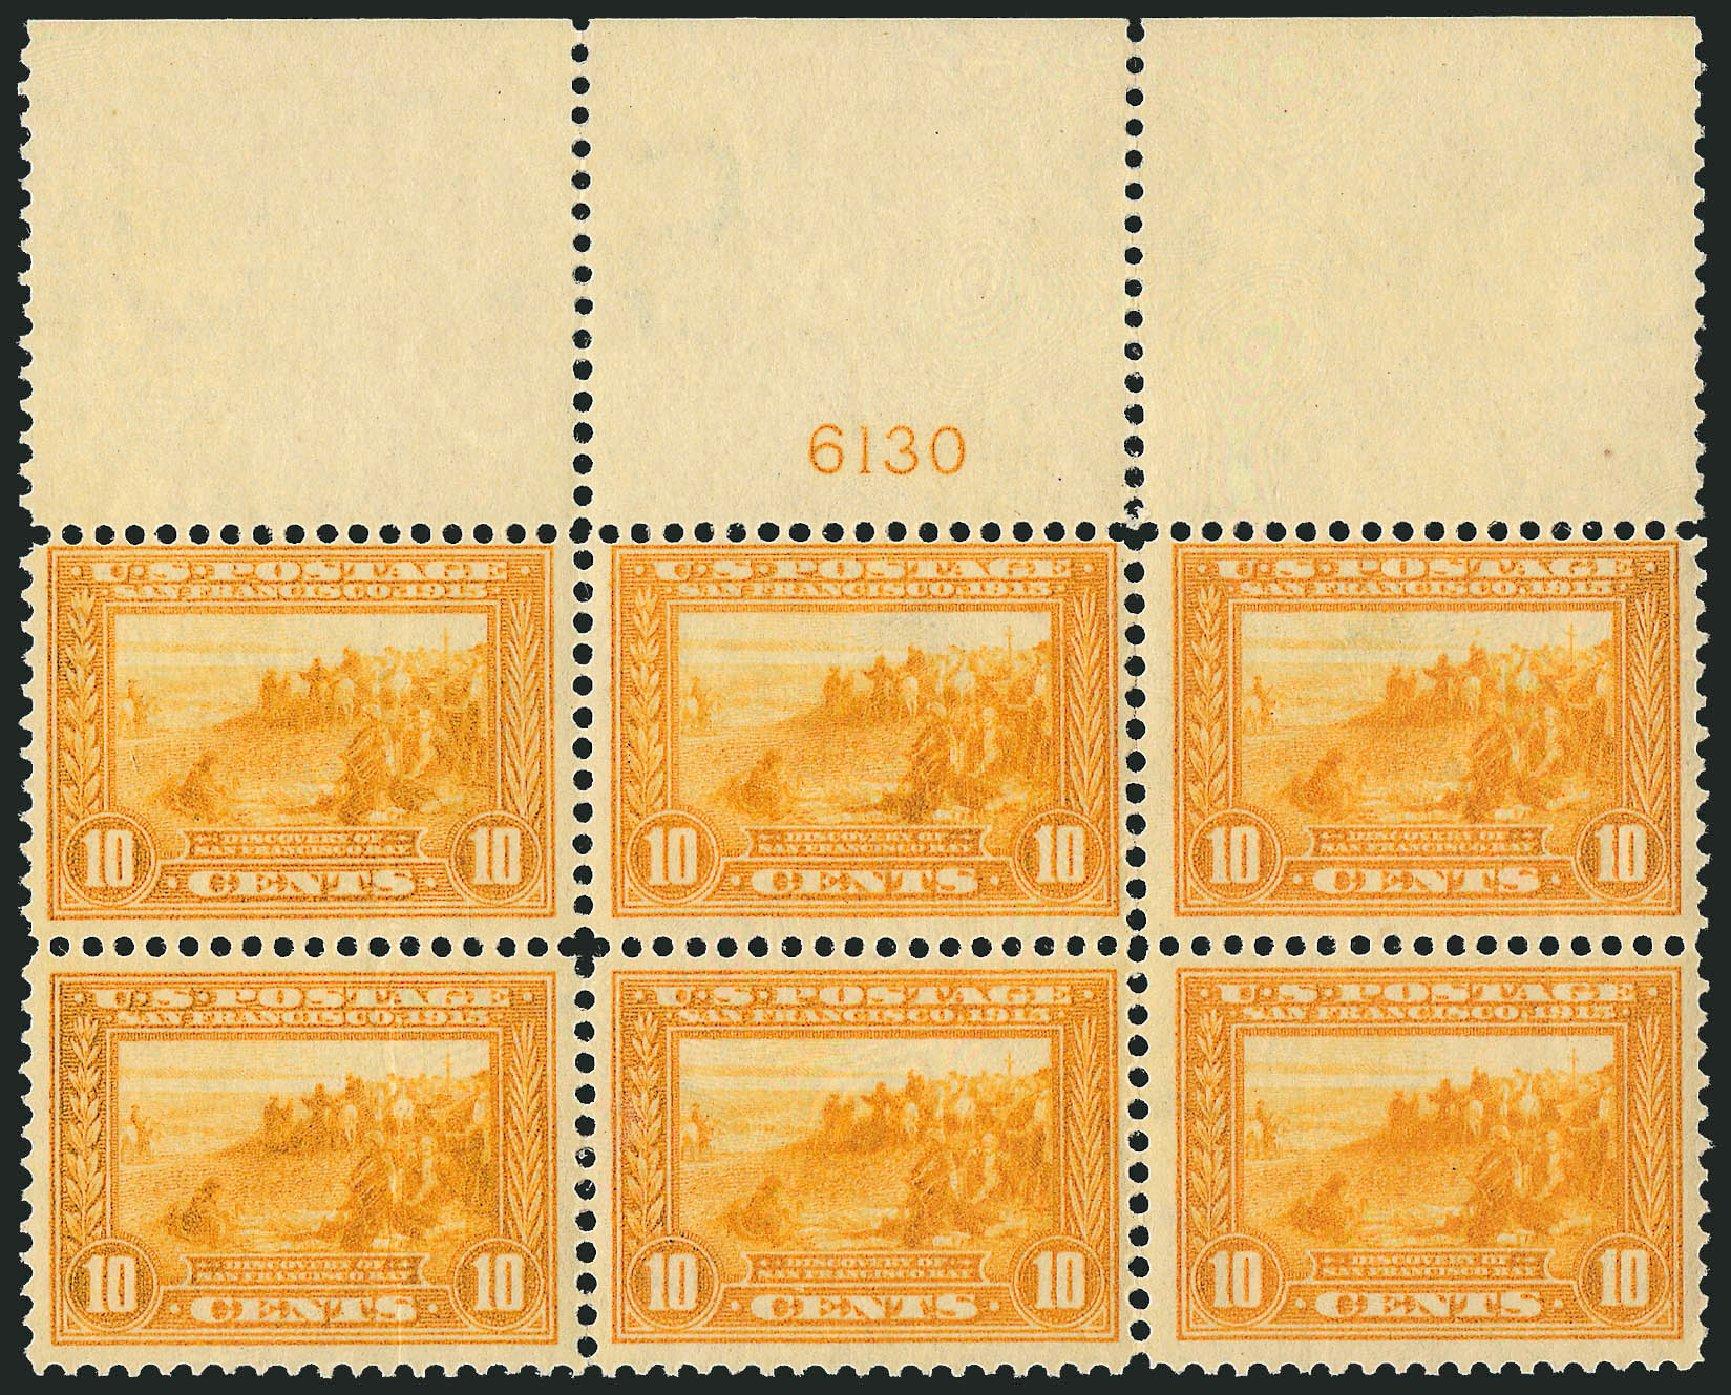 Value of US Stamps Scott Cat. #400: 10c 1913 Panama-Pacific Exposition. Robert Siegel Auction Galleries, Oct 2014, Sale 1082, Lot 452